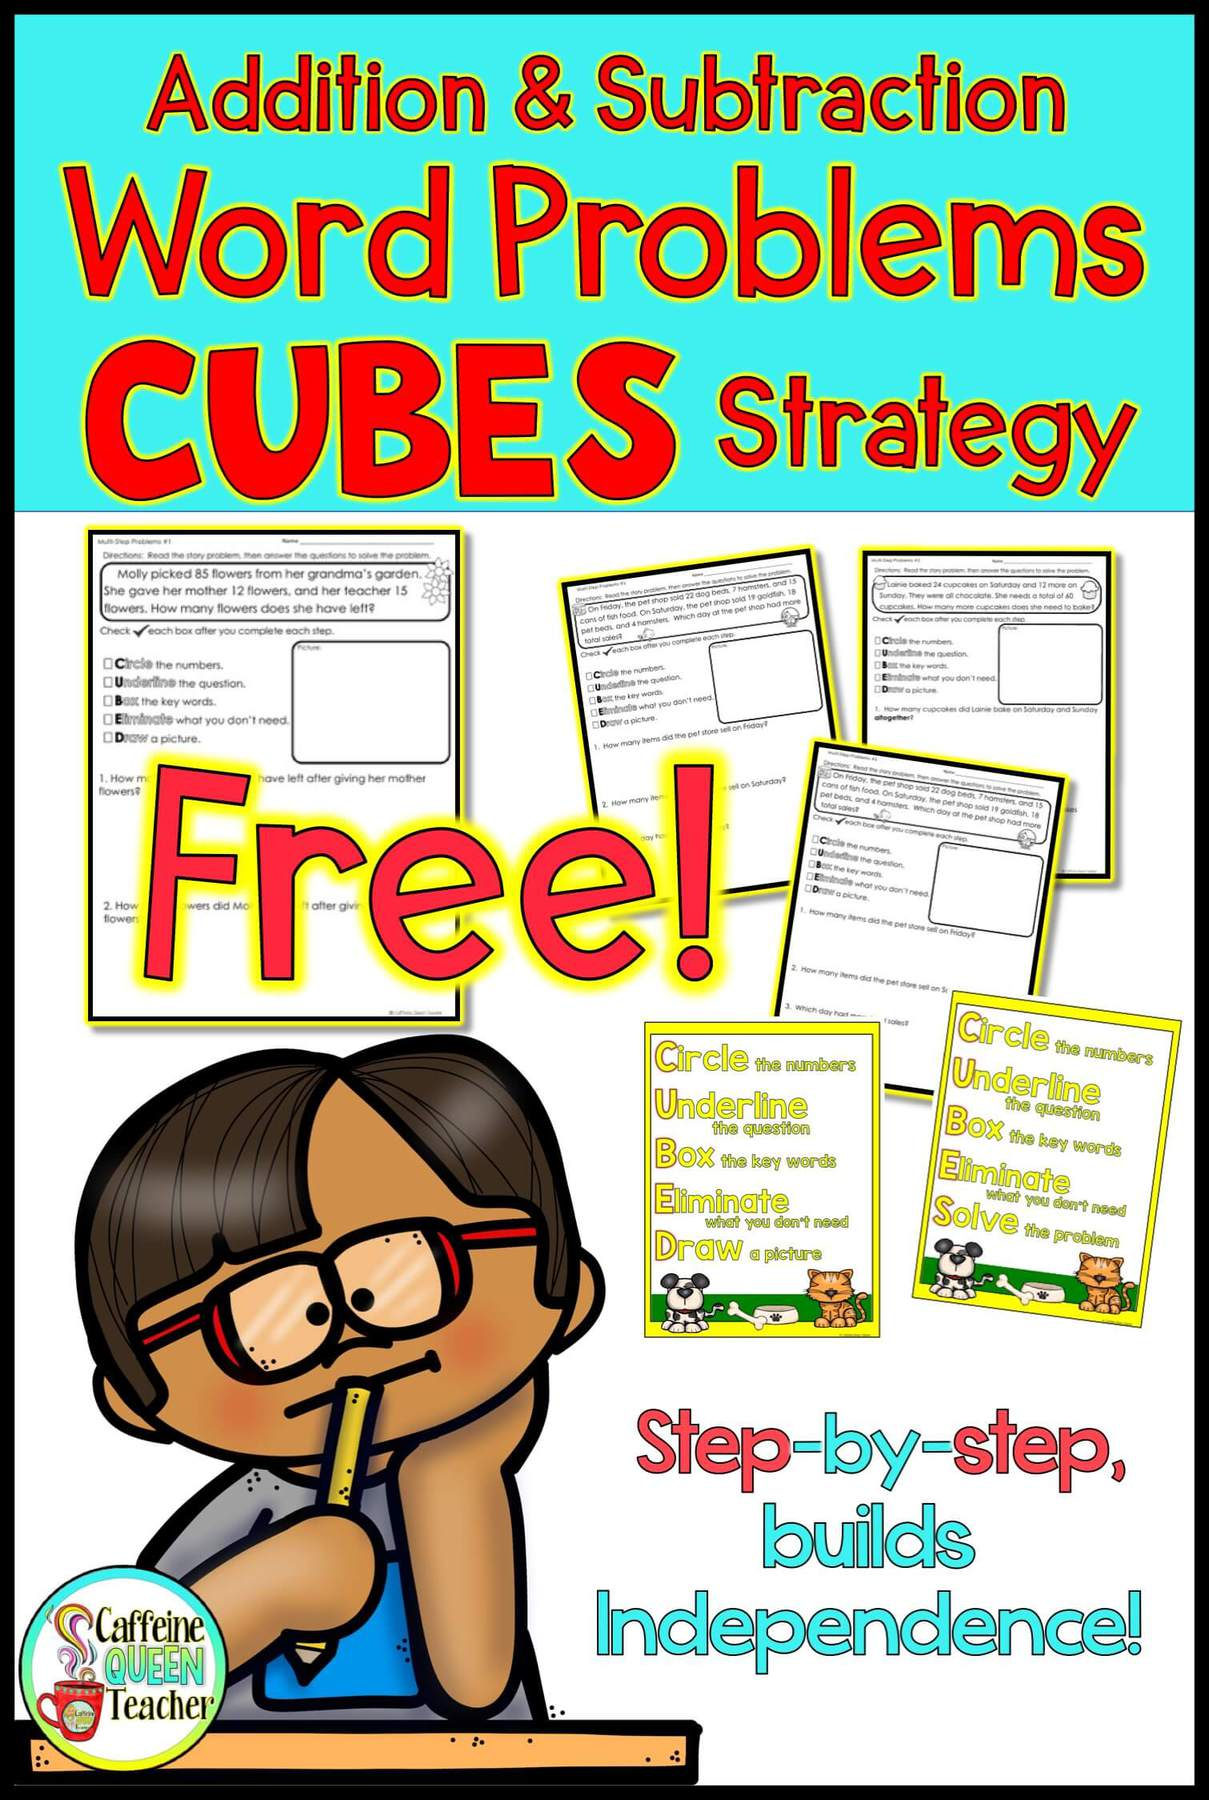 medium resolution of FREE Worksheet - Addition and Subtraction Word Problems Strategy - Caffeine  Queen Teacher